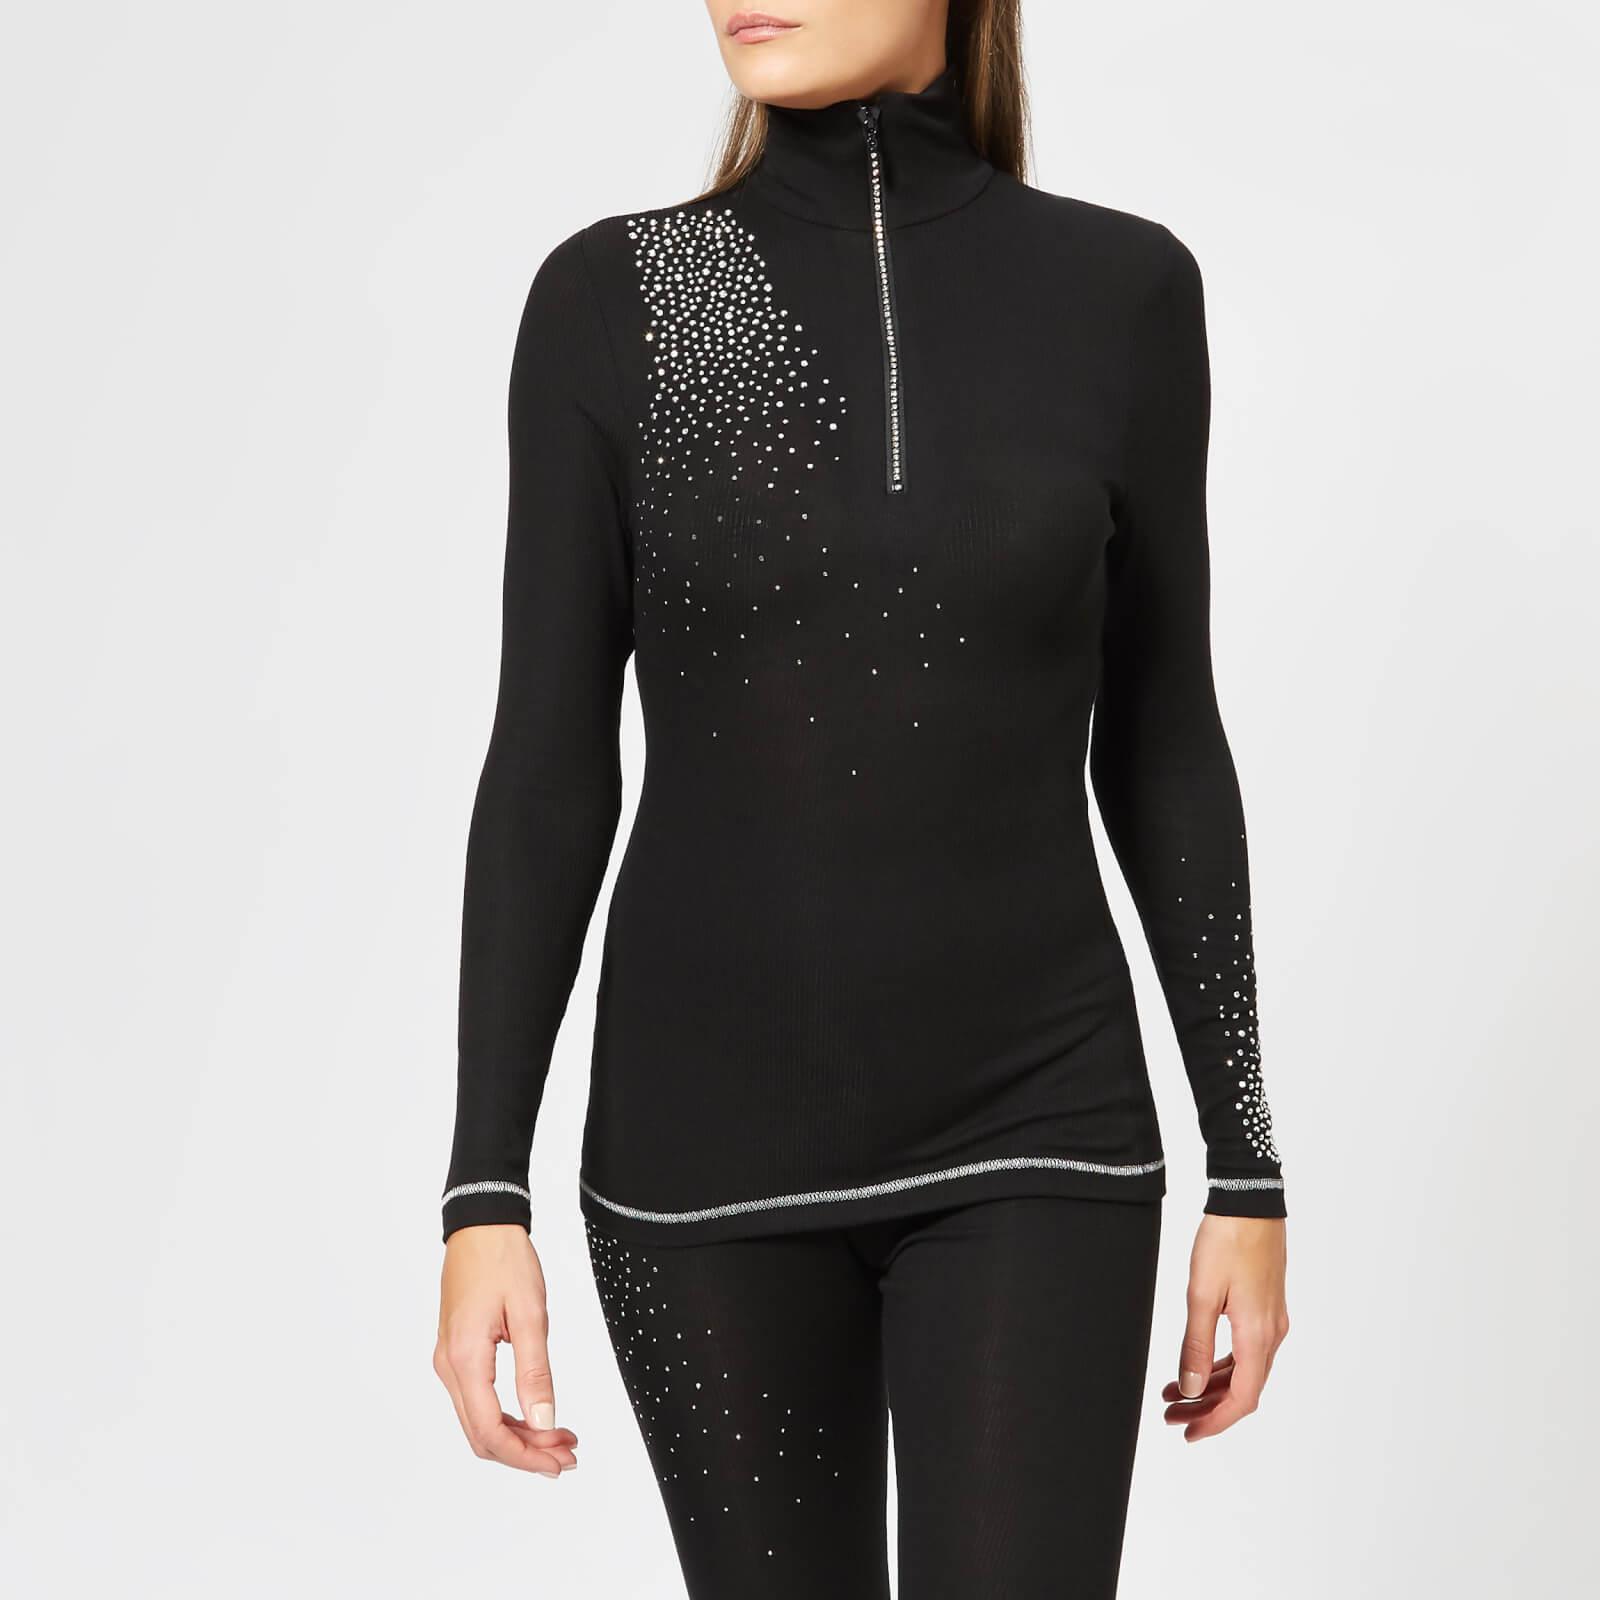 S'No Queen Women's Classic Zip Polo Shirt - Black - S - Black